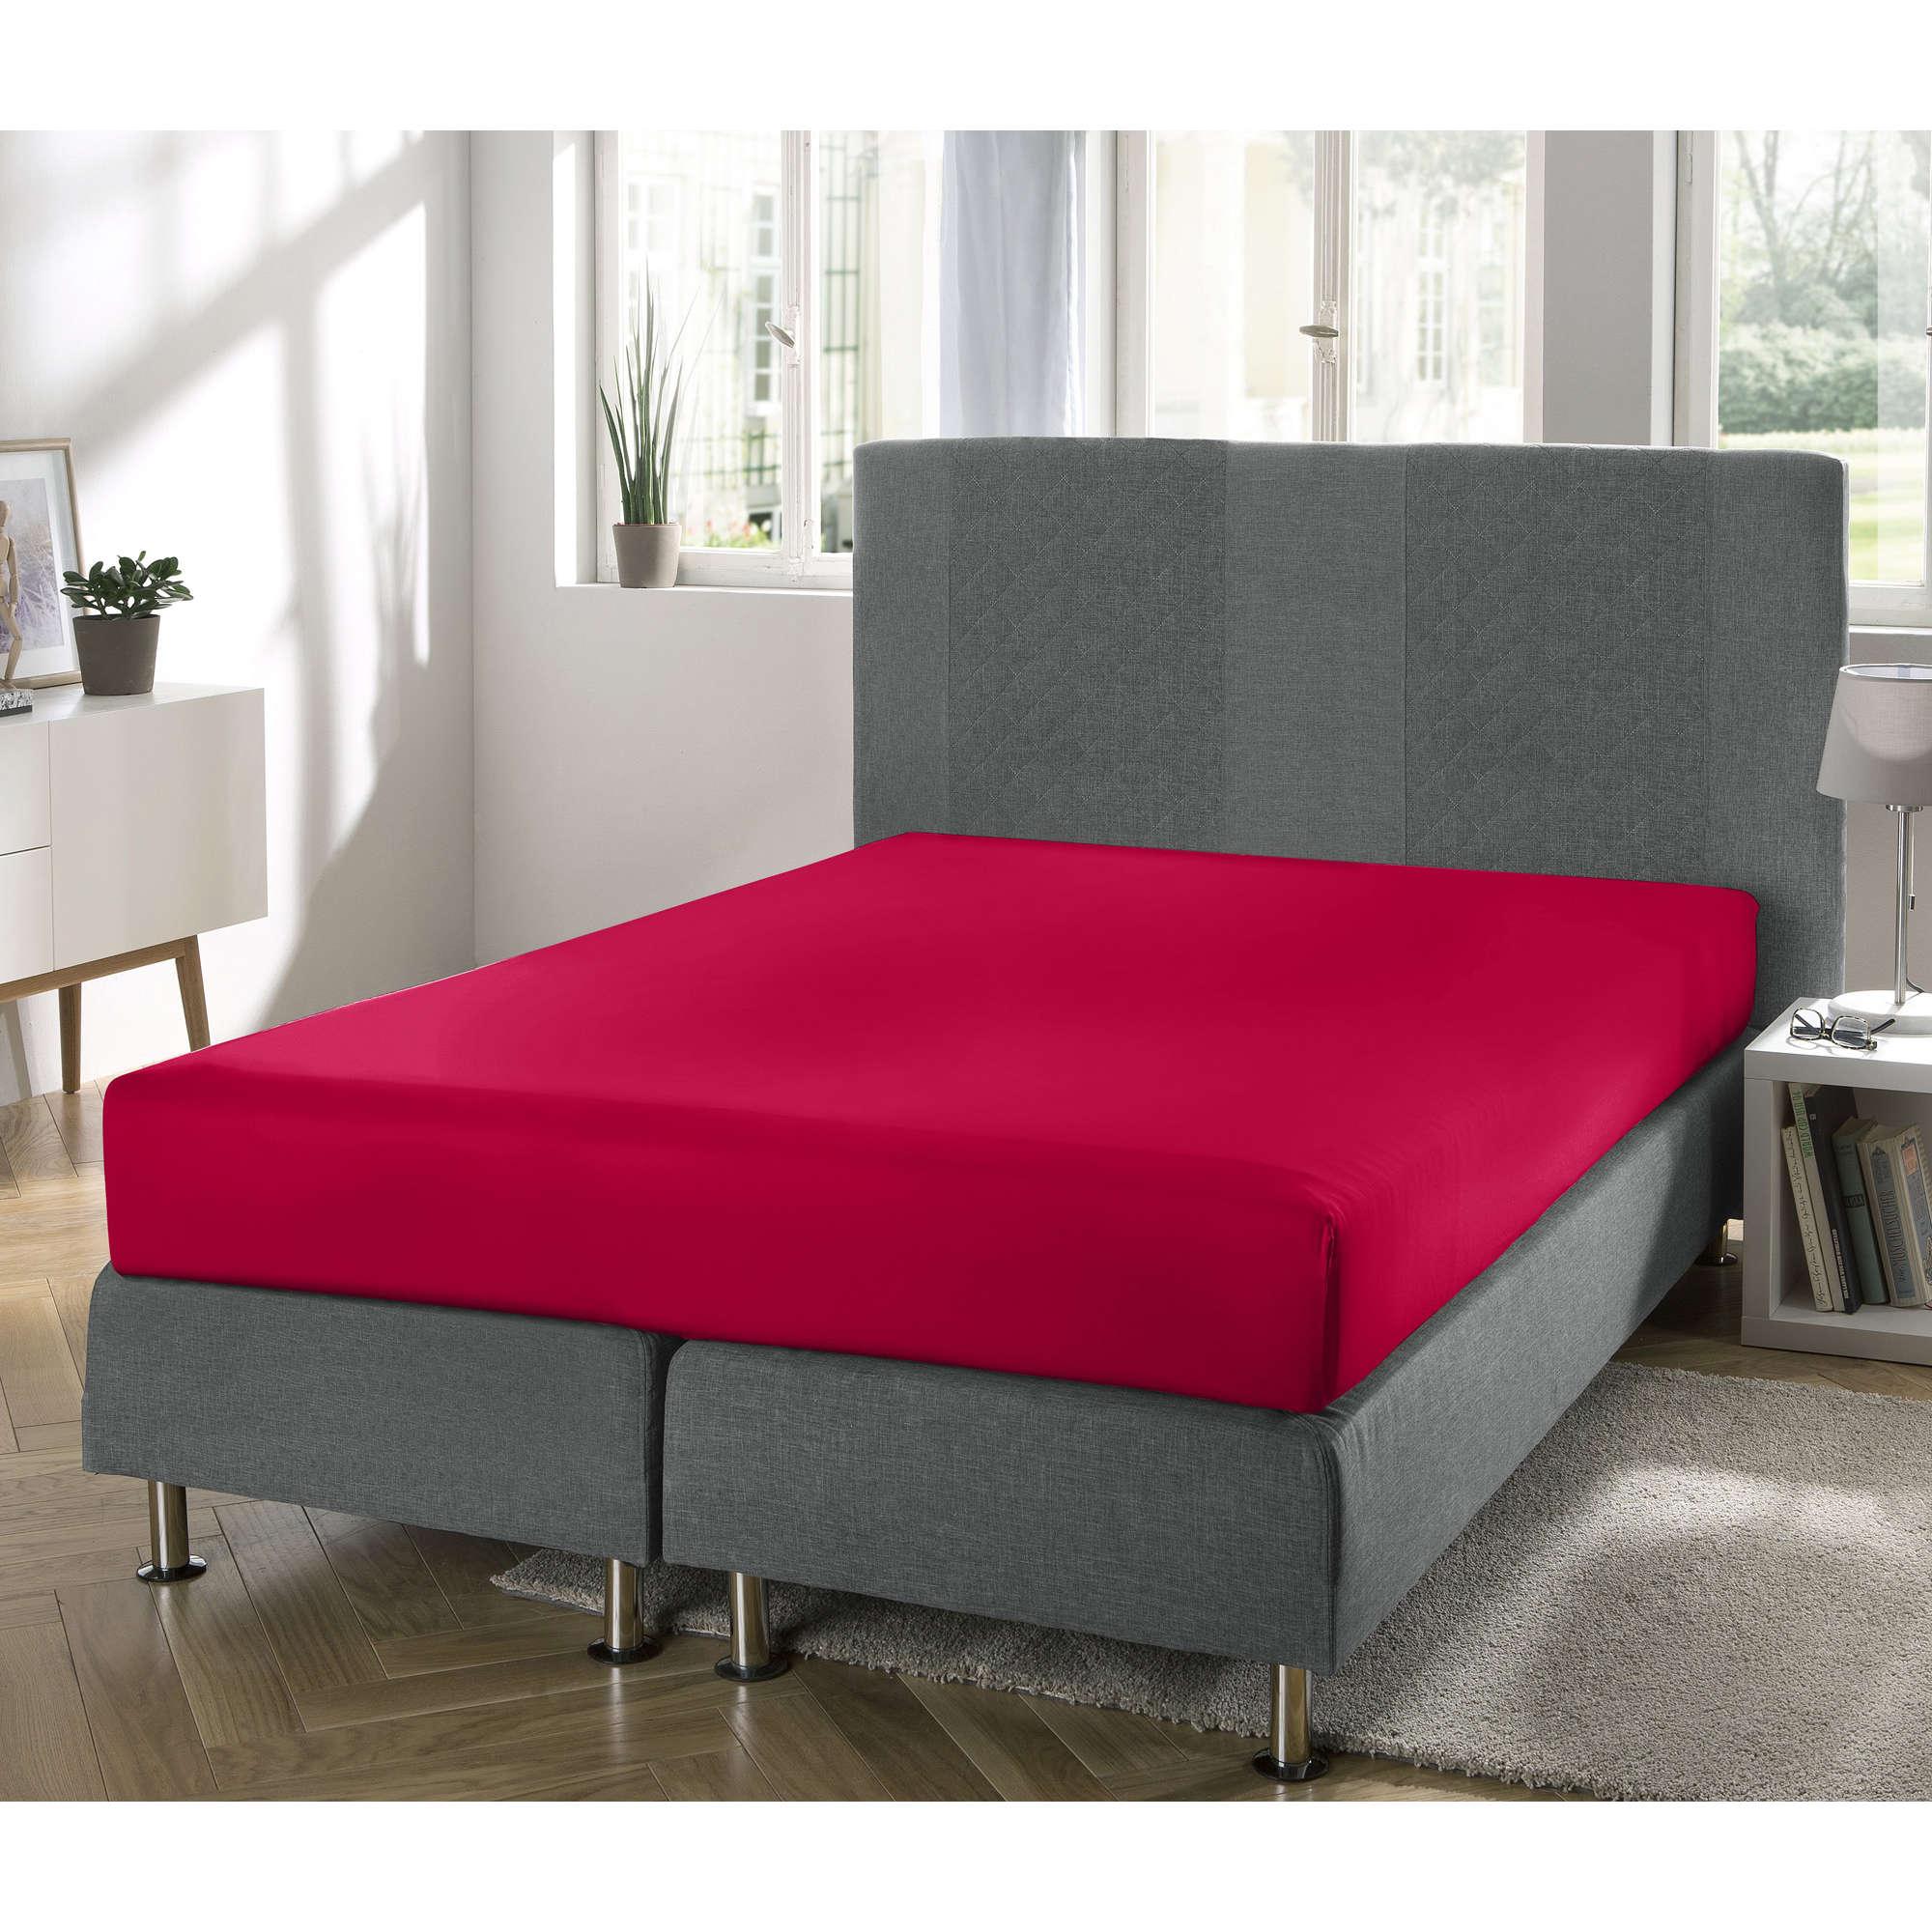 erwin m ller boxspringbett spannbettlaken freising single jersey ebay. Black Bedroom Furniture Sets. Home Design Ideas